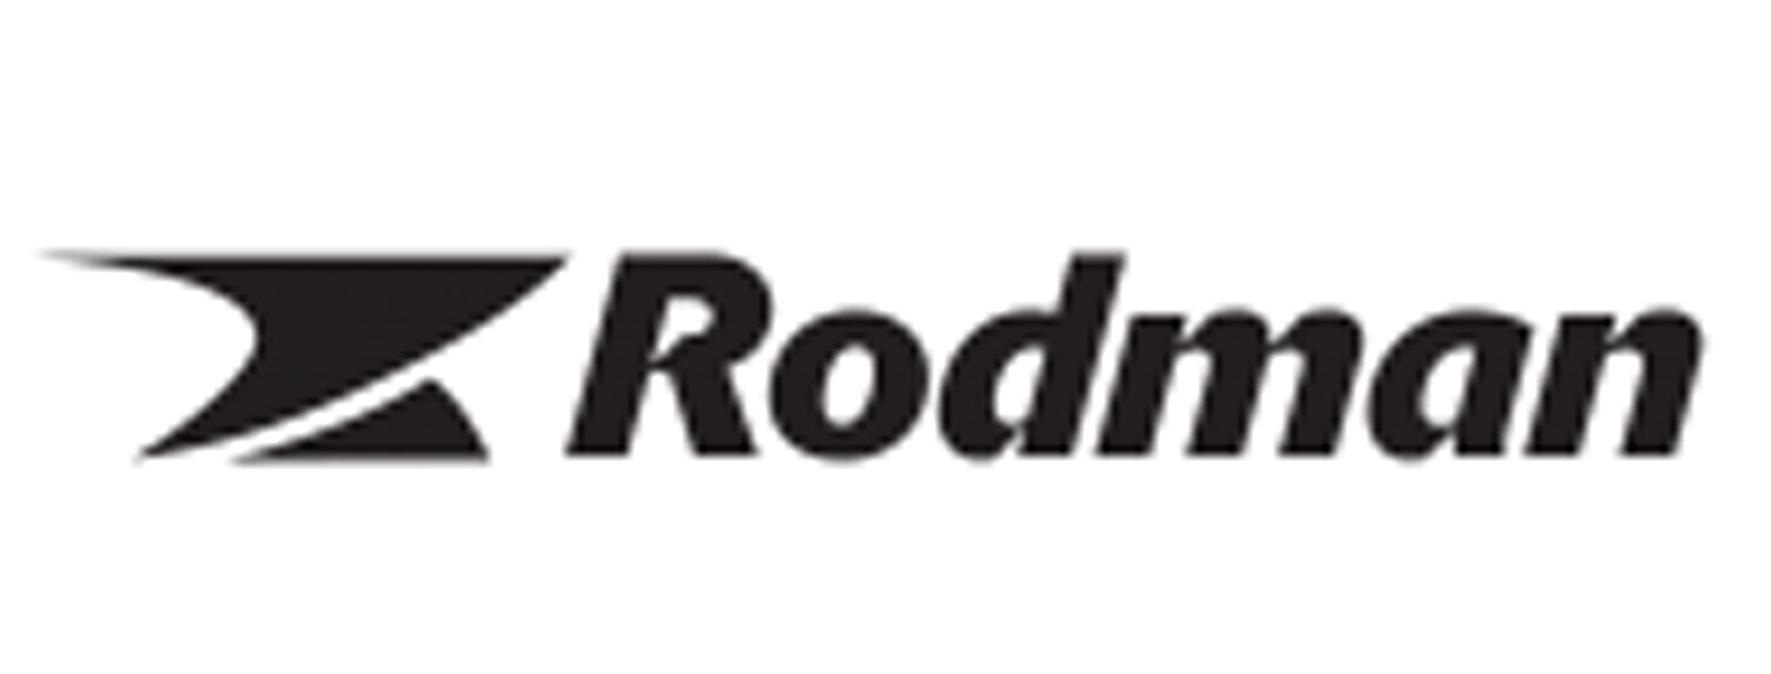 Bateau Rodman